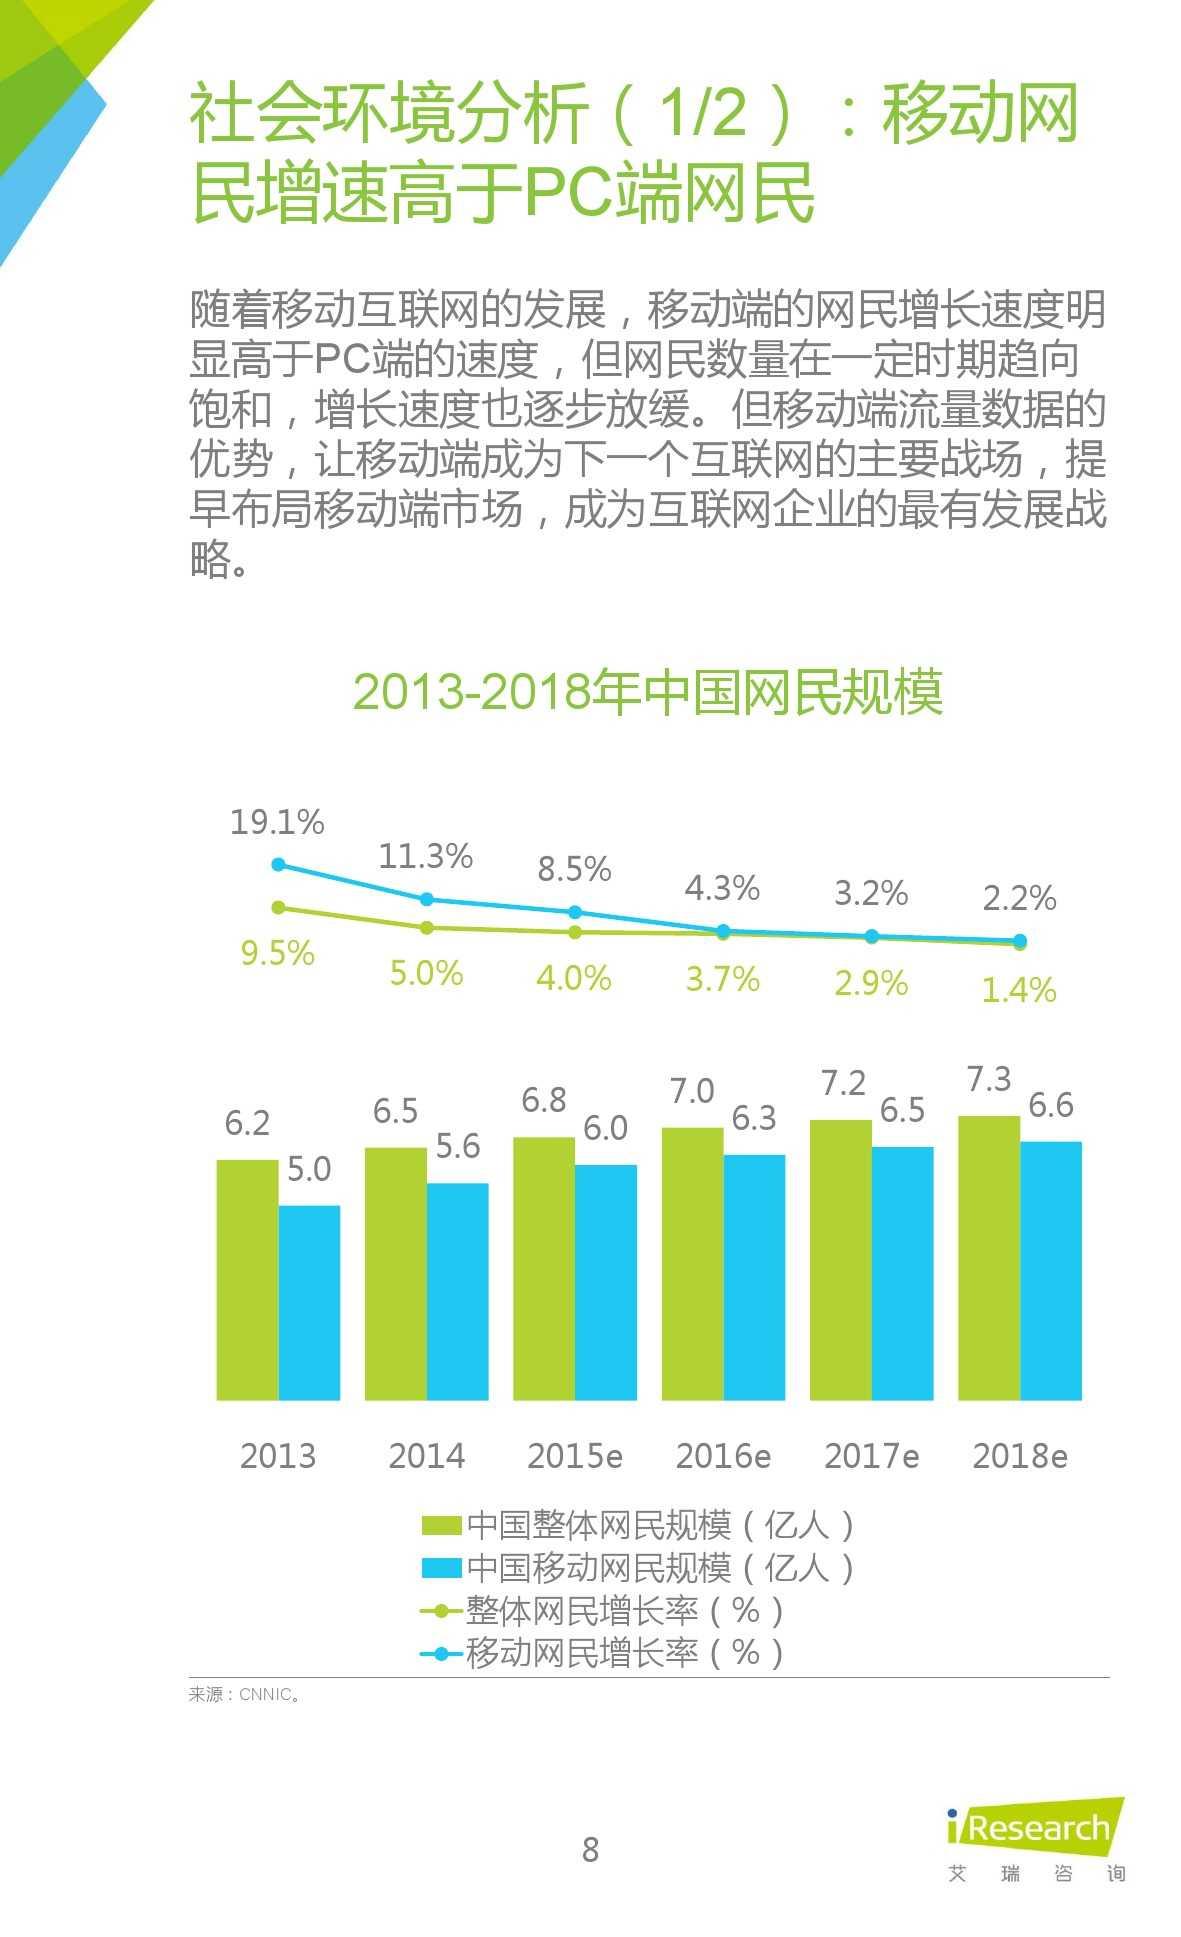 iResearch-2015年中国在线教育平台研究报告_000008